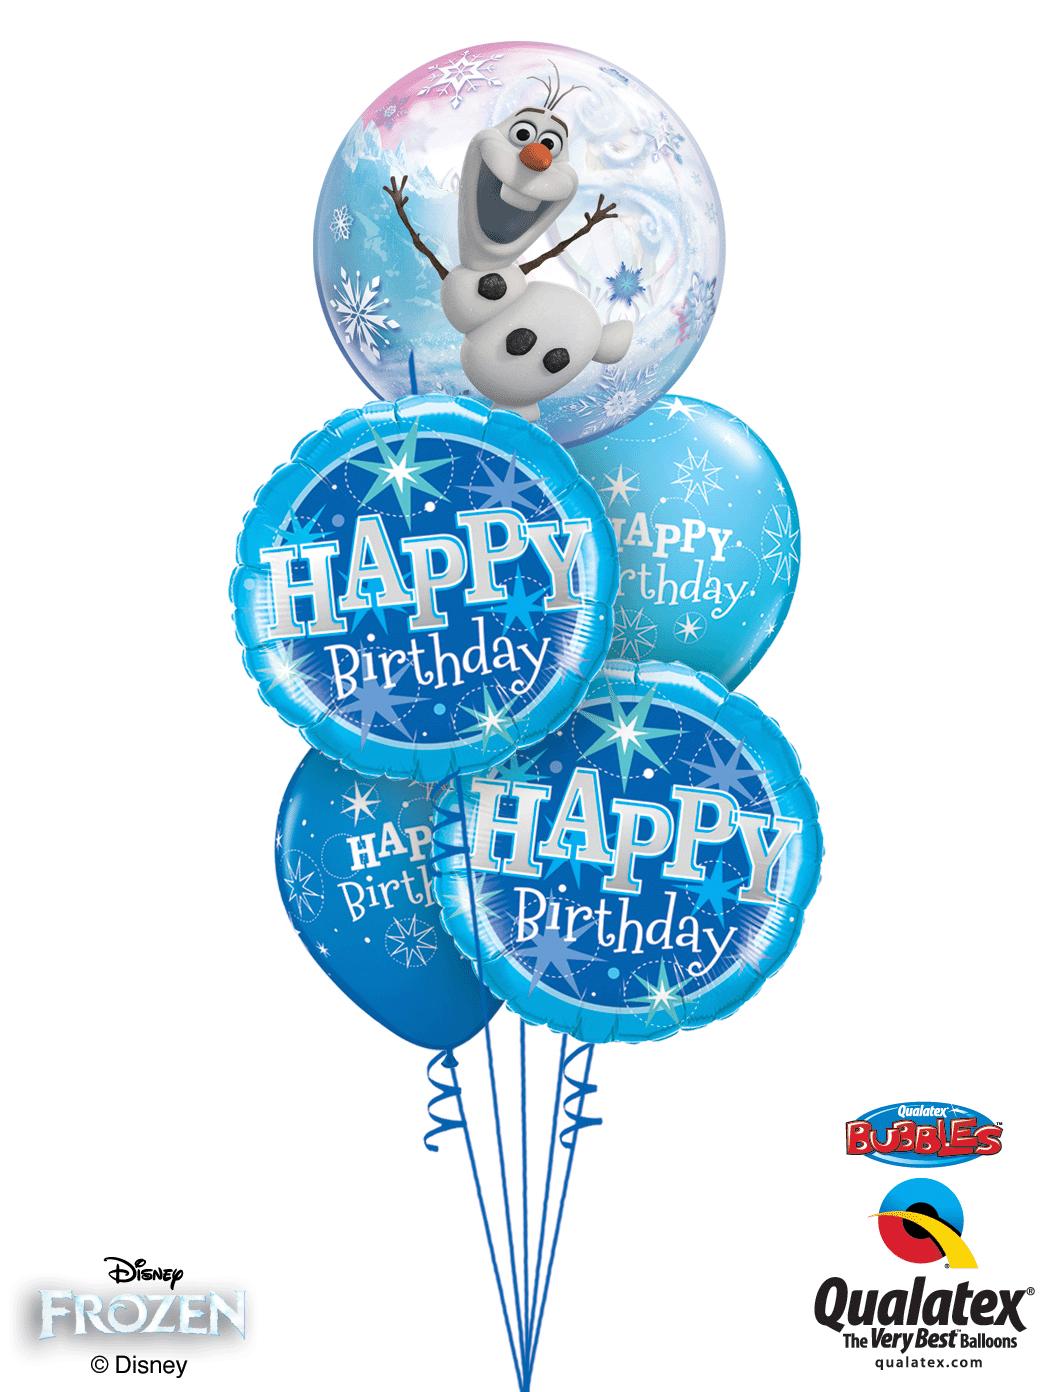 Birthday//Party DISNEY FROZEN Qualatex Latex /& Bubble Balloons Anna,Elsa,Olaf